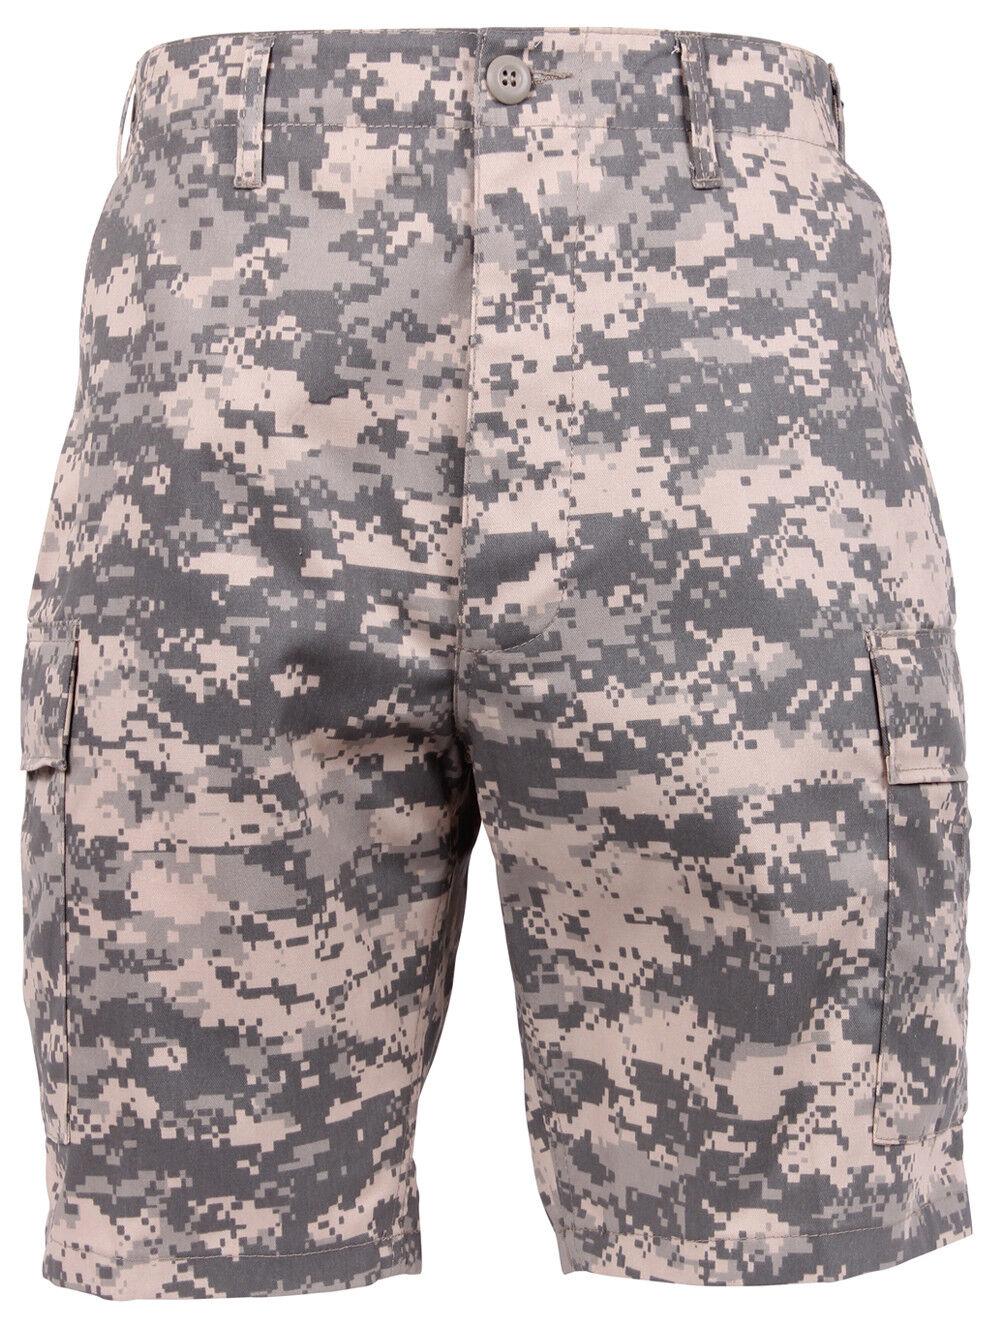 Shorts camo army acu digital military bdu style camouflage mens redhco 65312